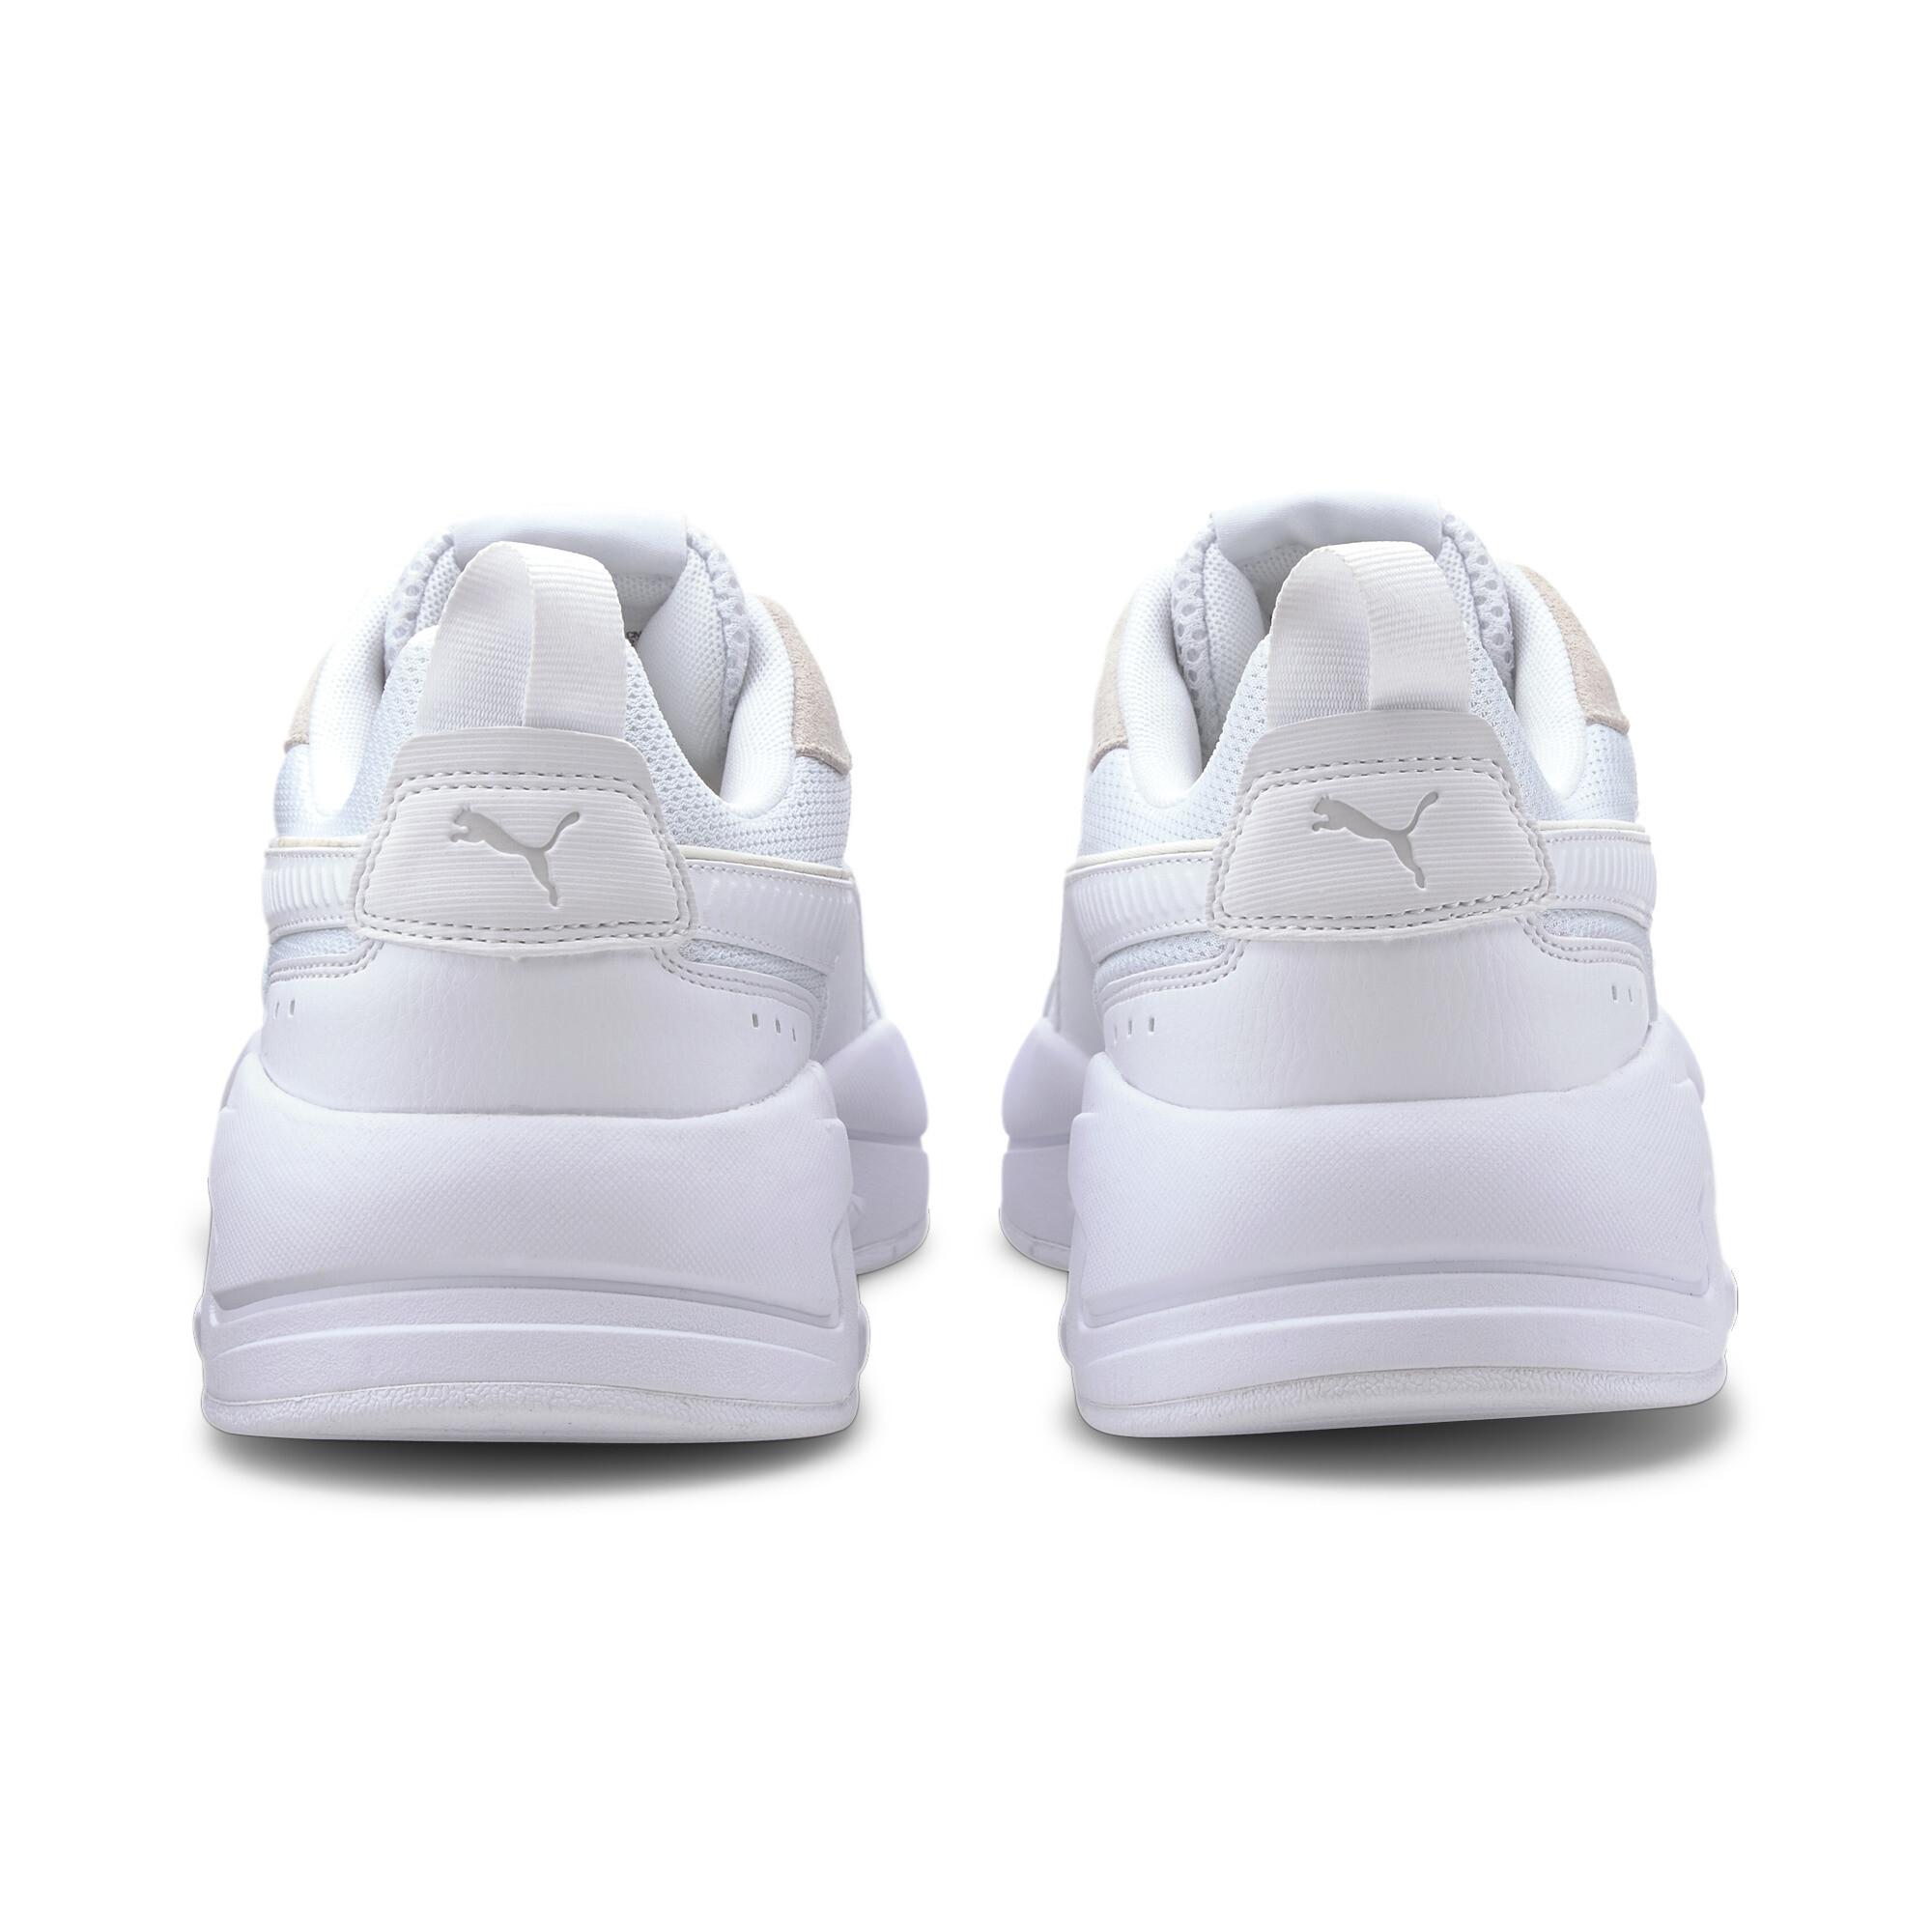 PUMA-Men-039-s-X-RAY-Sneakers thumbnail 24